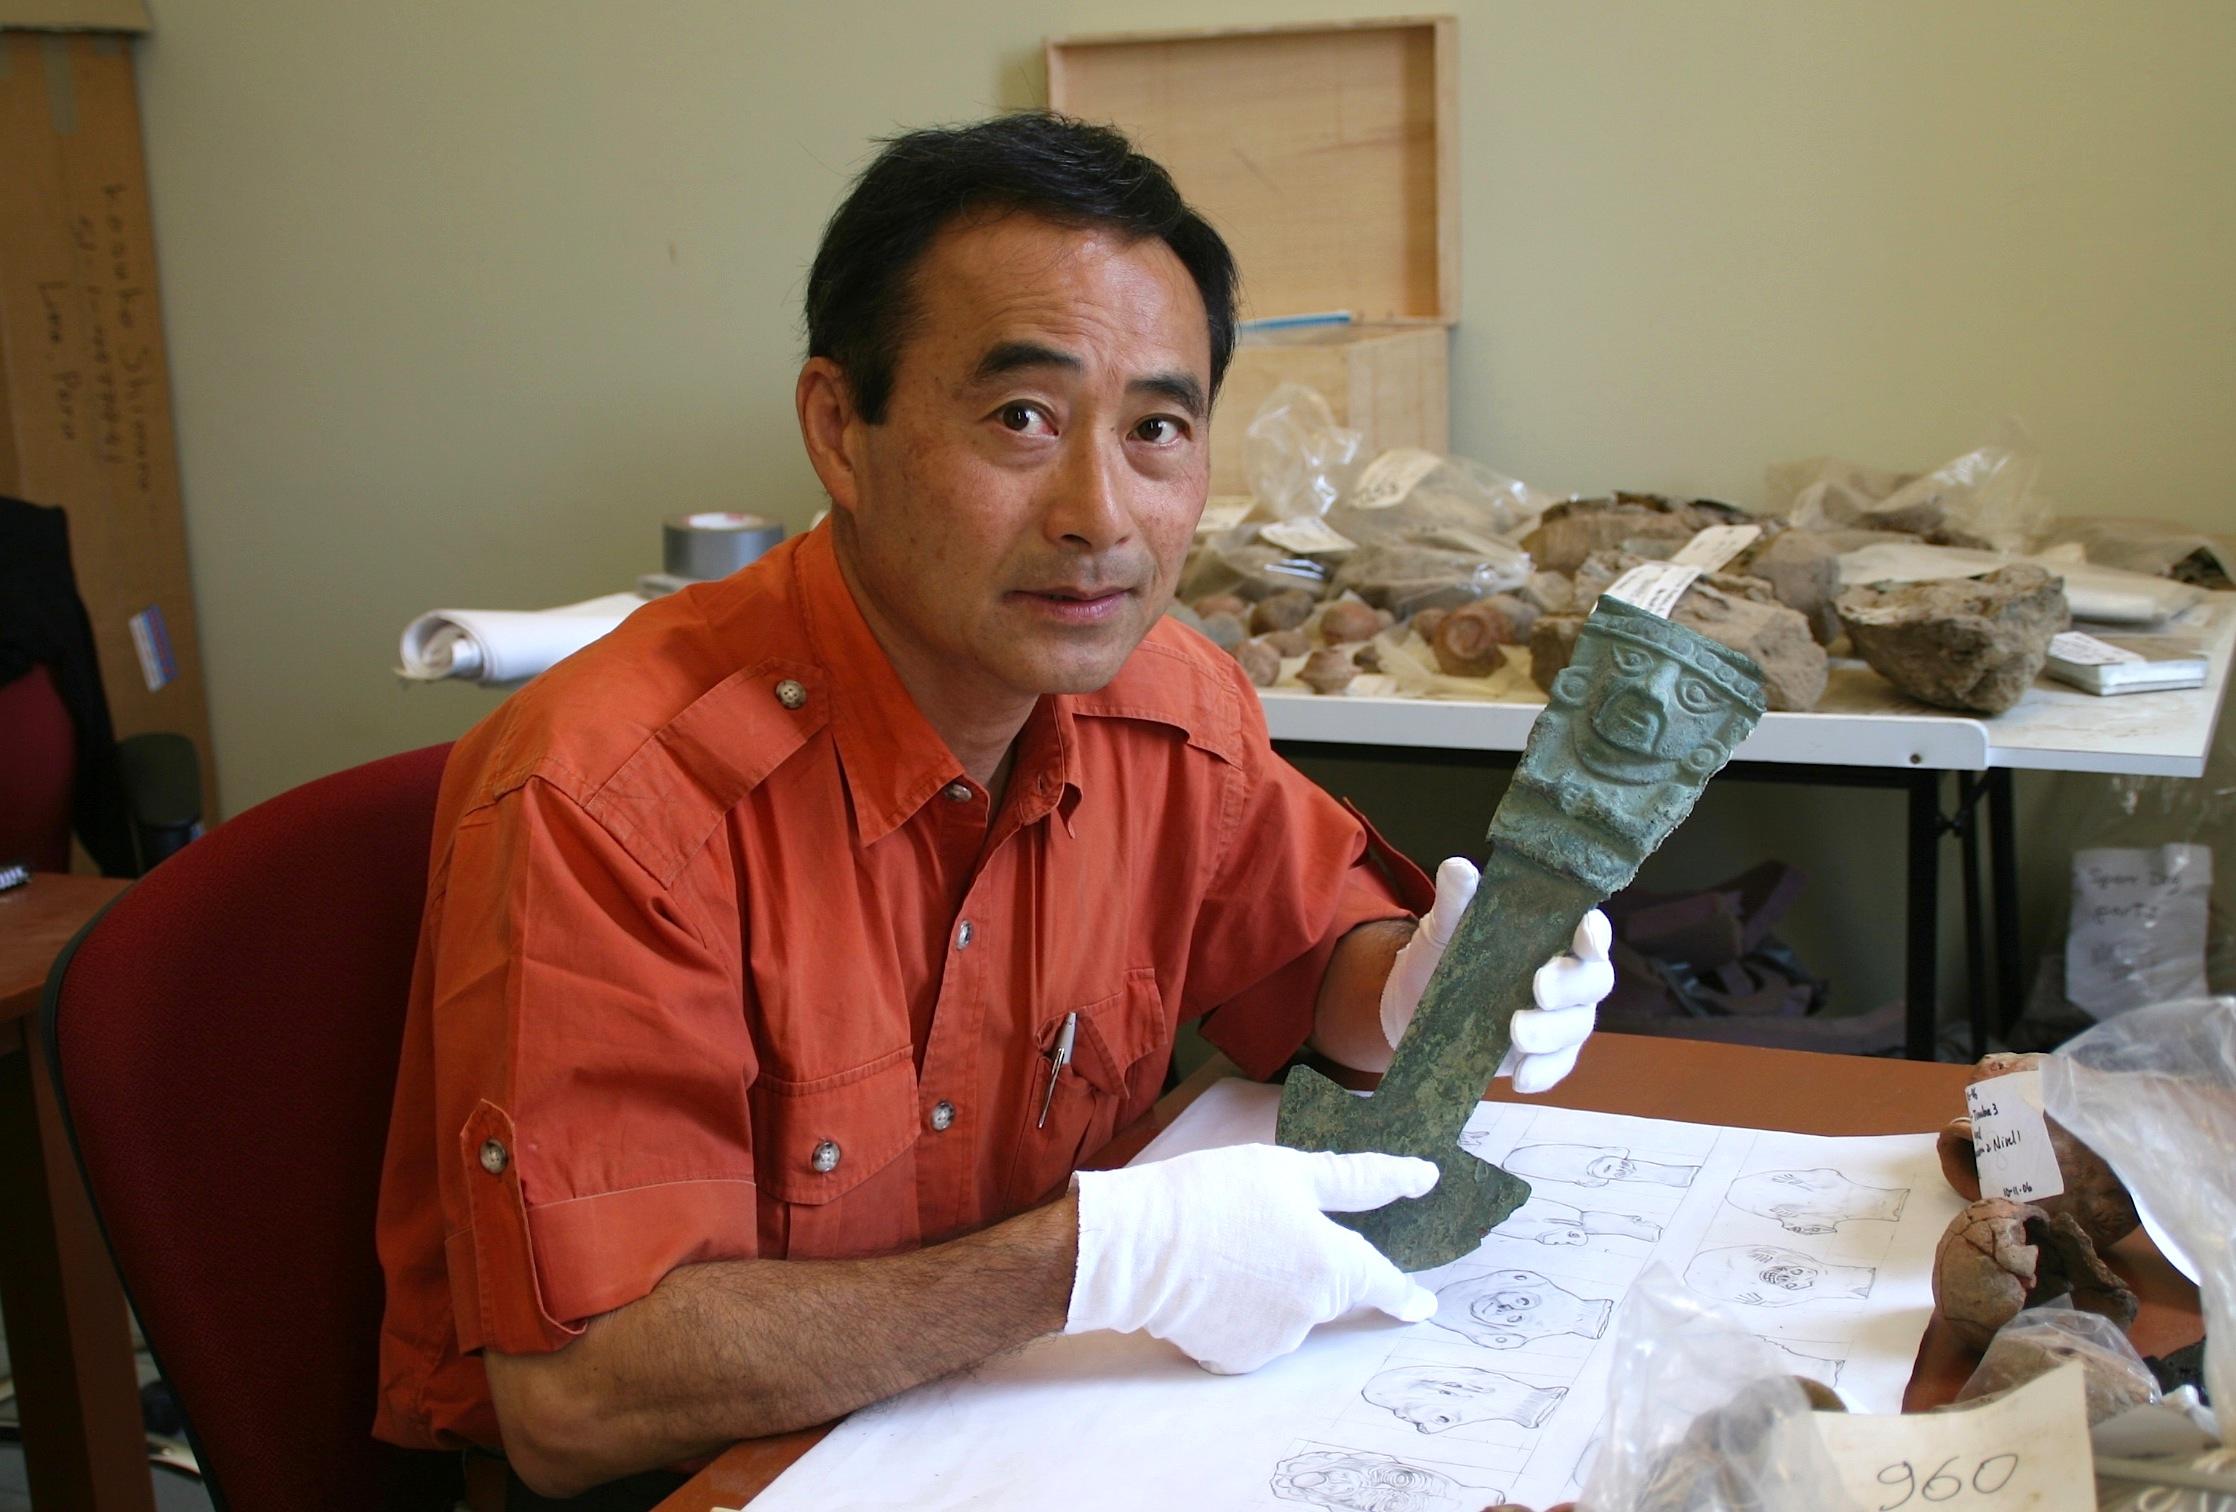 Professor Izumi Shimada holding tumi knife excavated at Huaca Loro in 2006